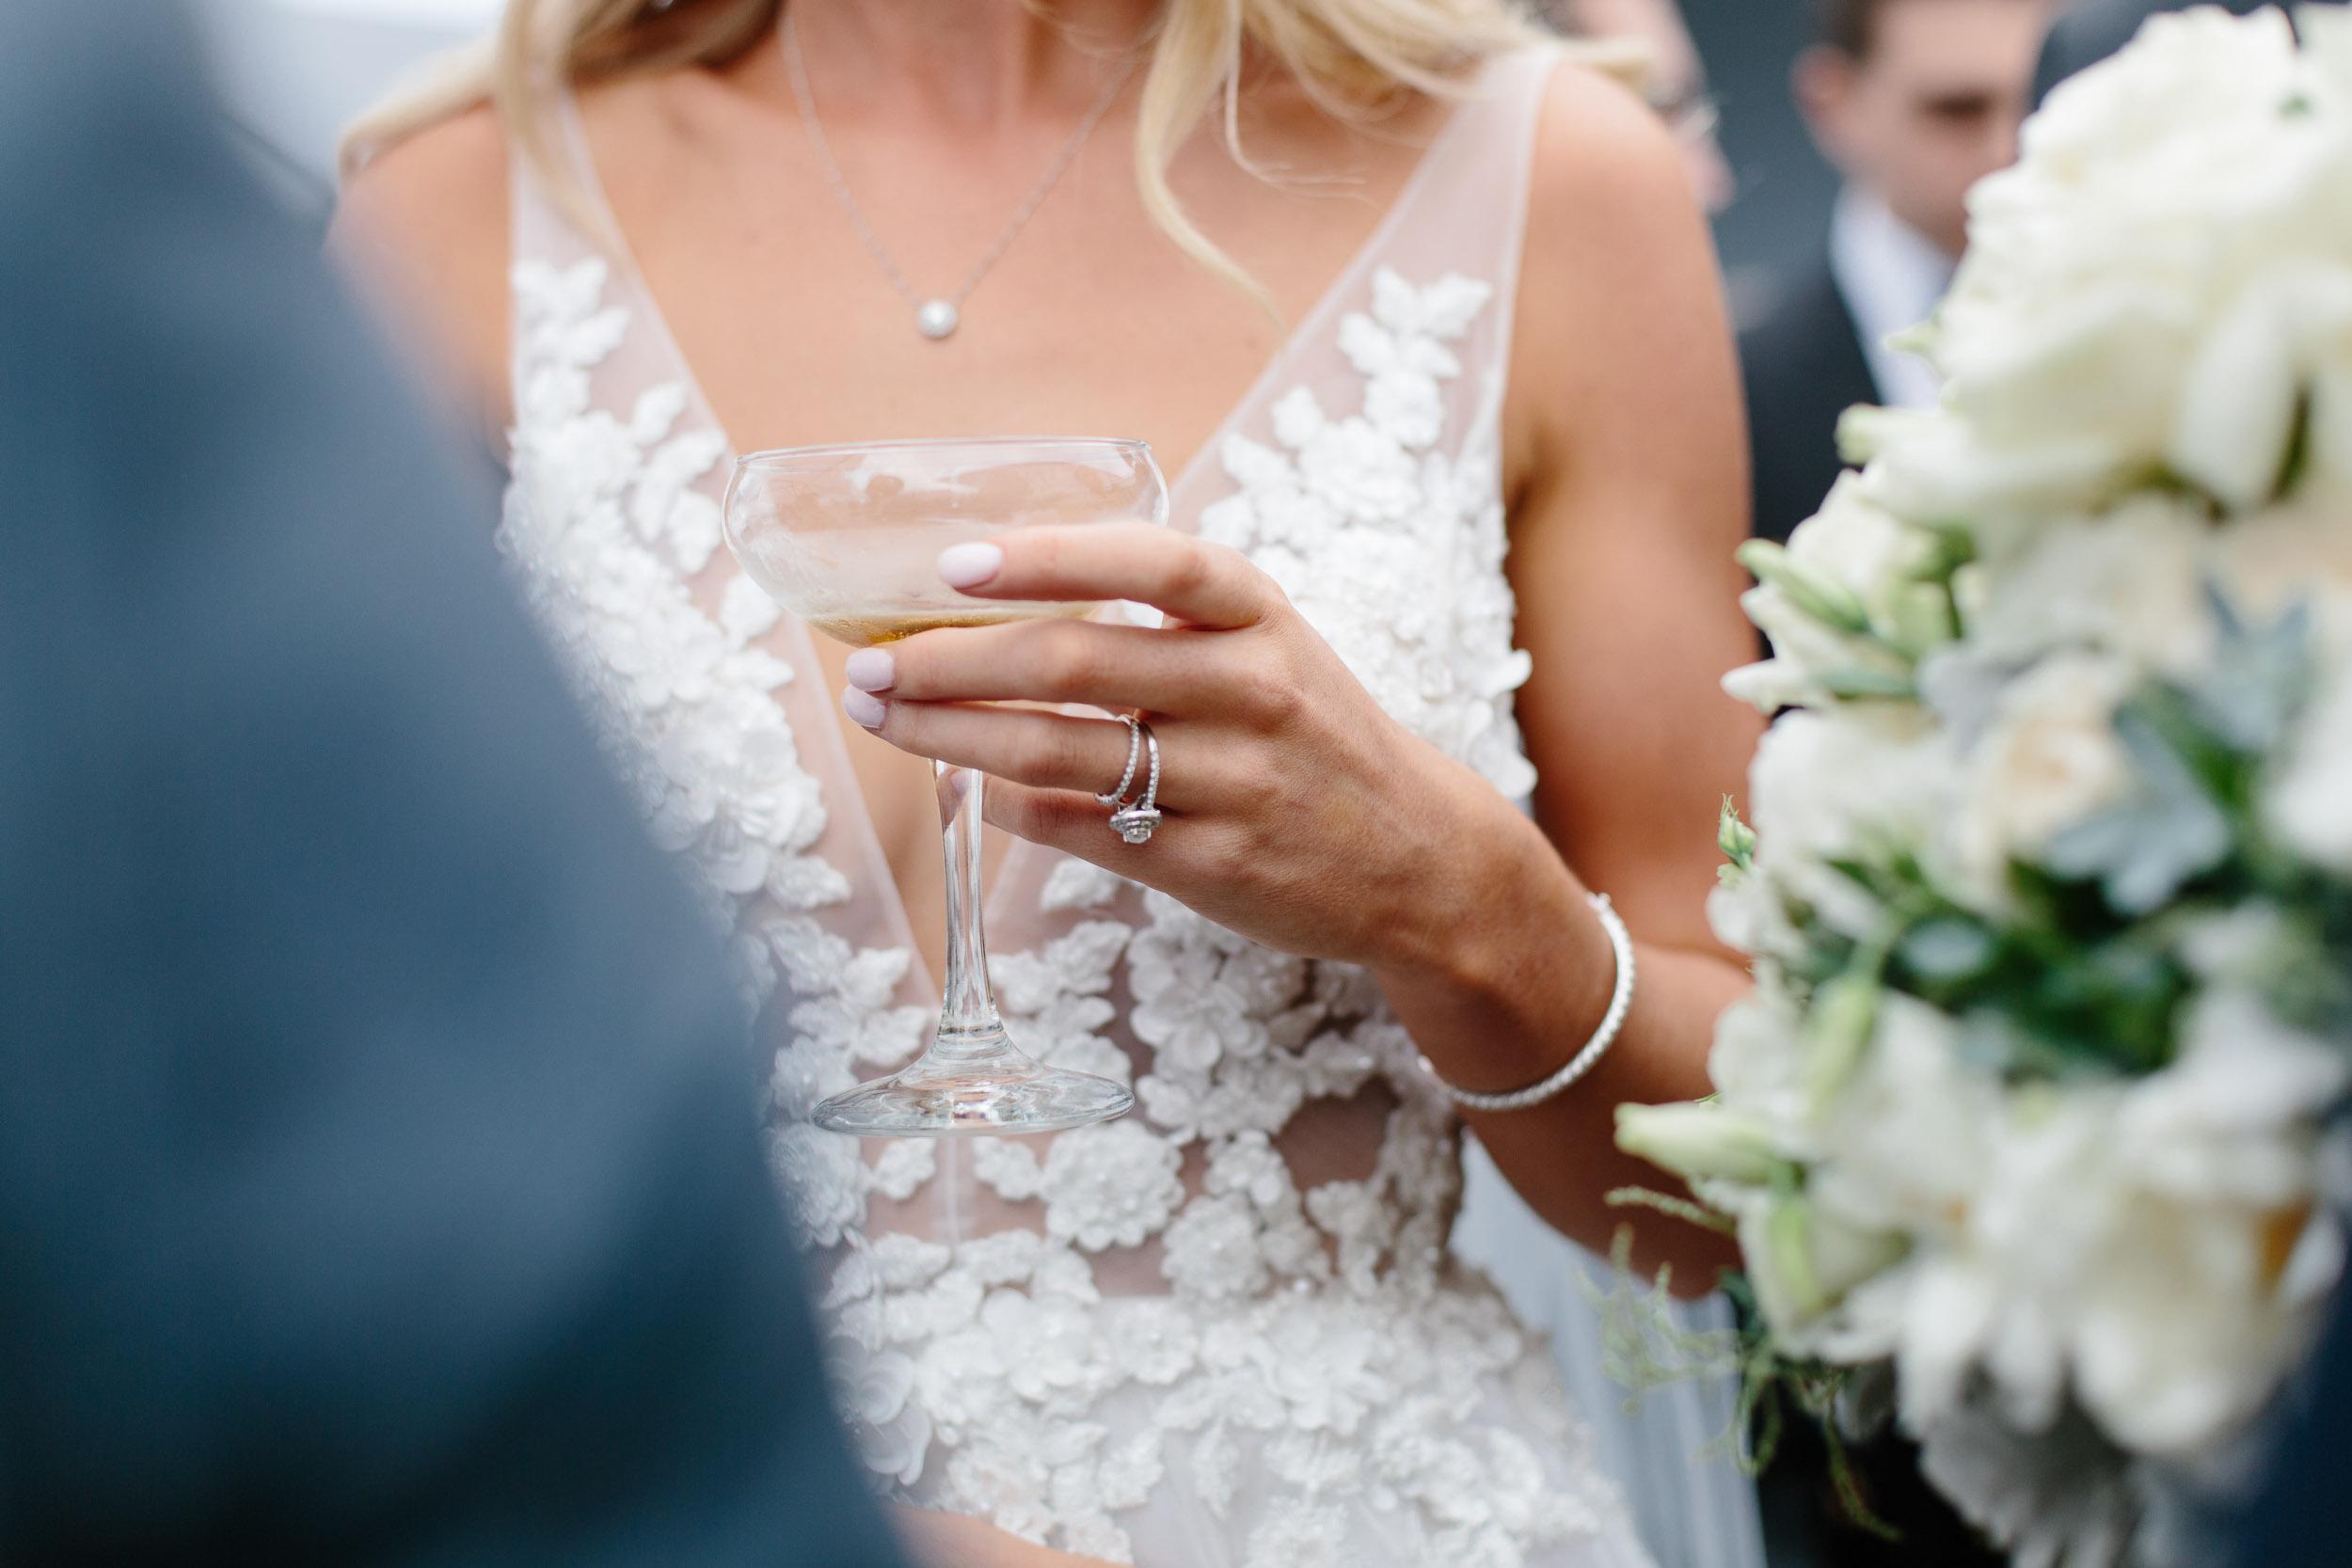 Kas-Richards-Mornington-Peninsula-Private-Property-Wedding-Marianna-Hardwick-Gown-587.jpg